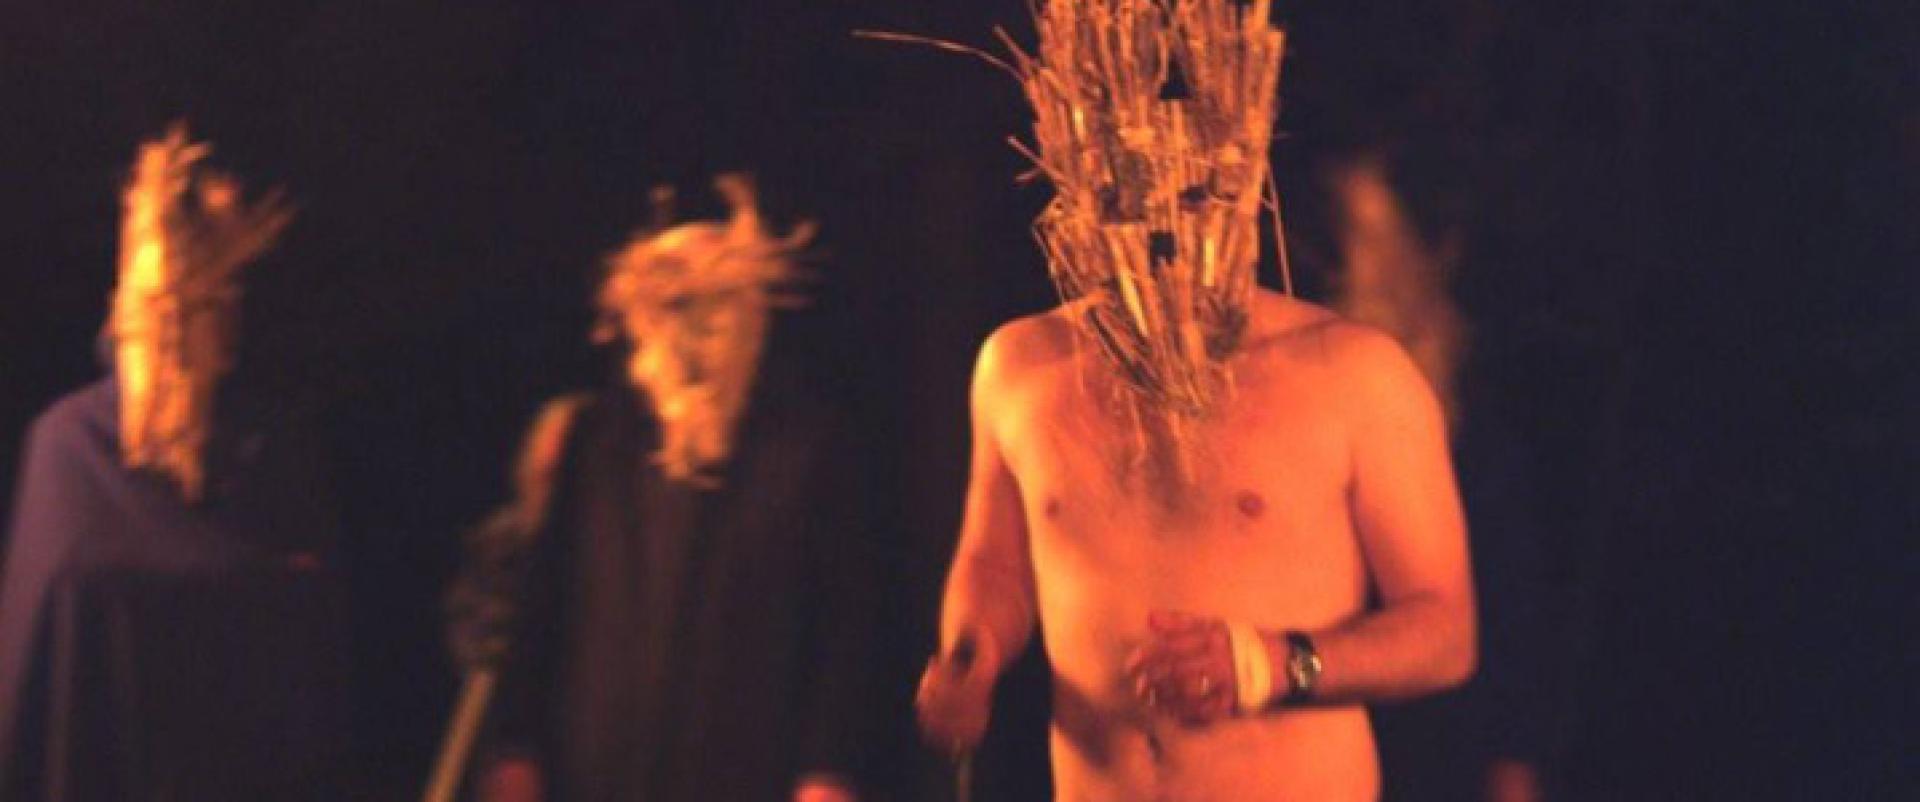 Kill List - Halállista (2011)